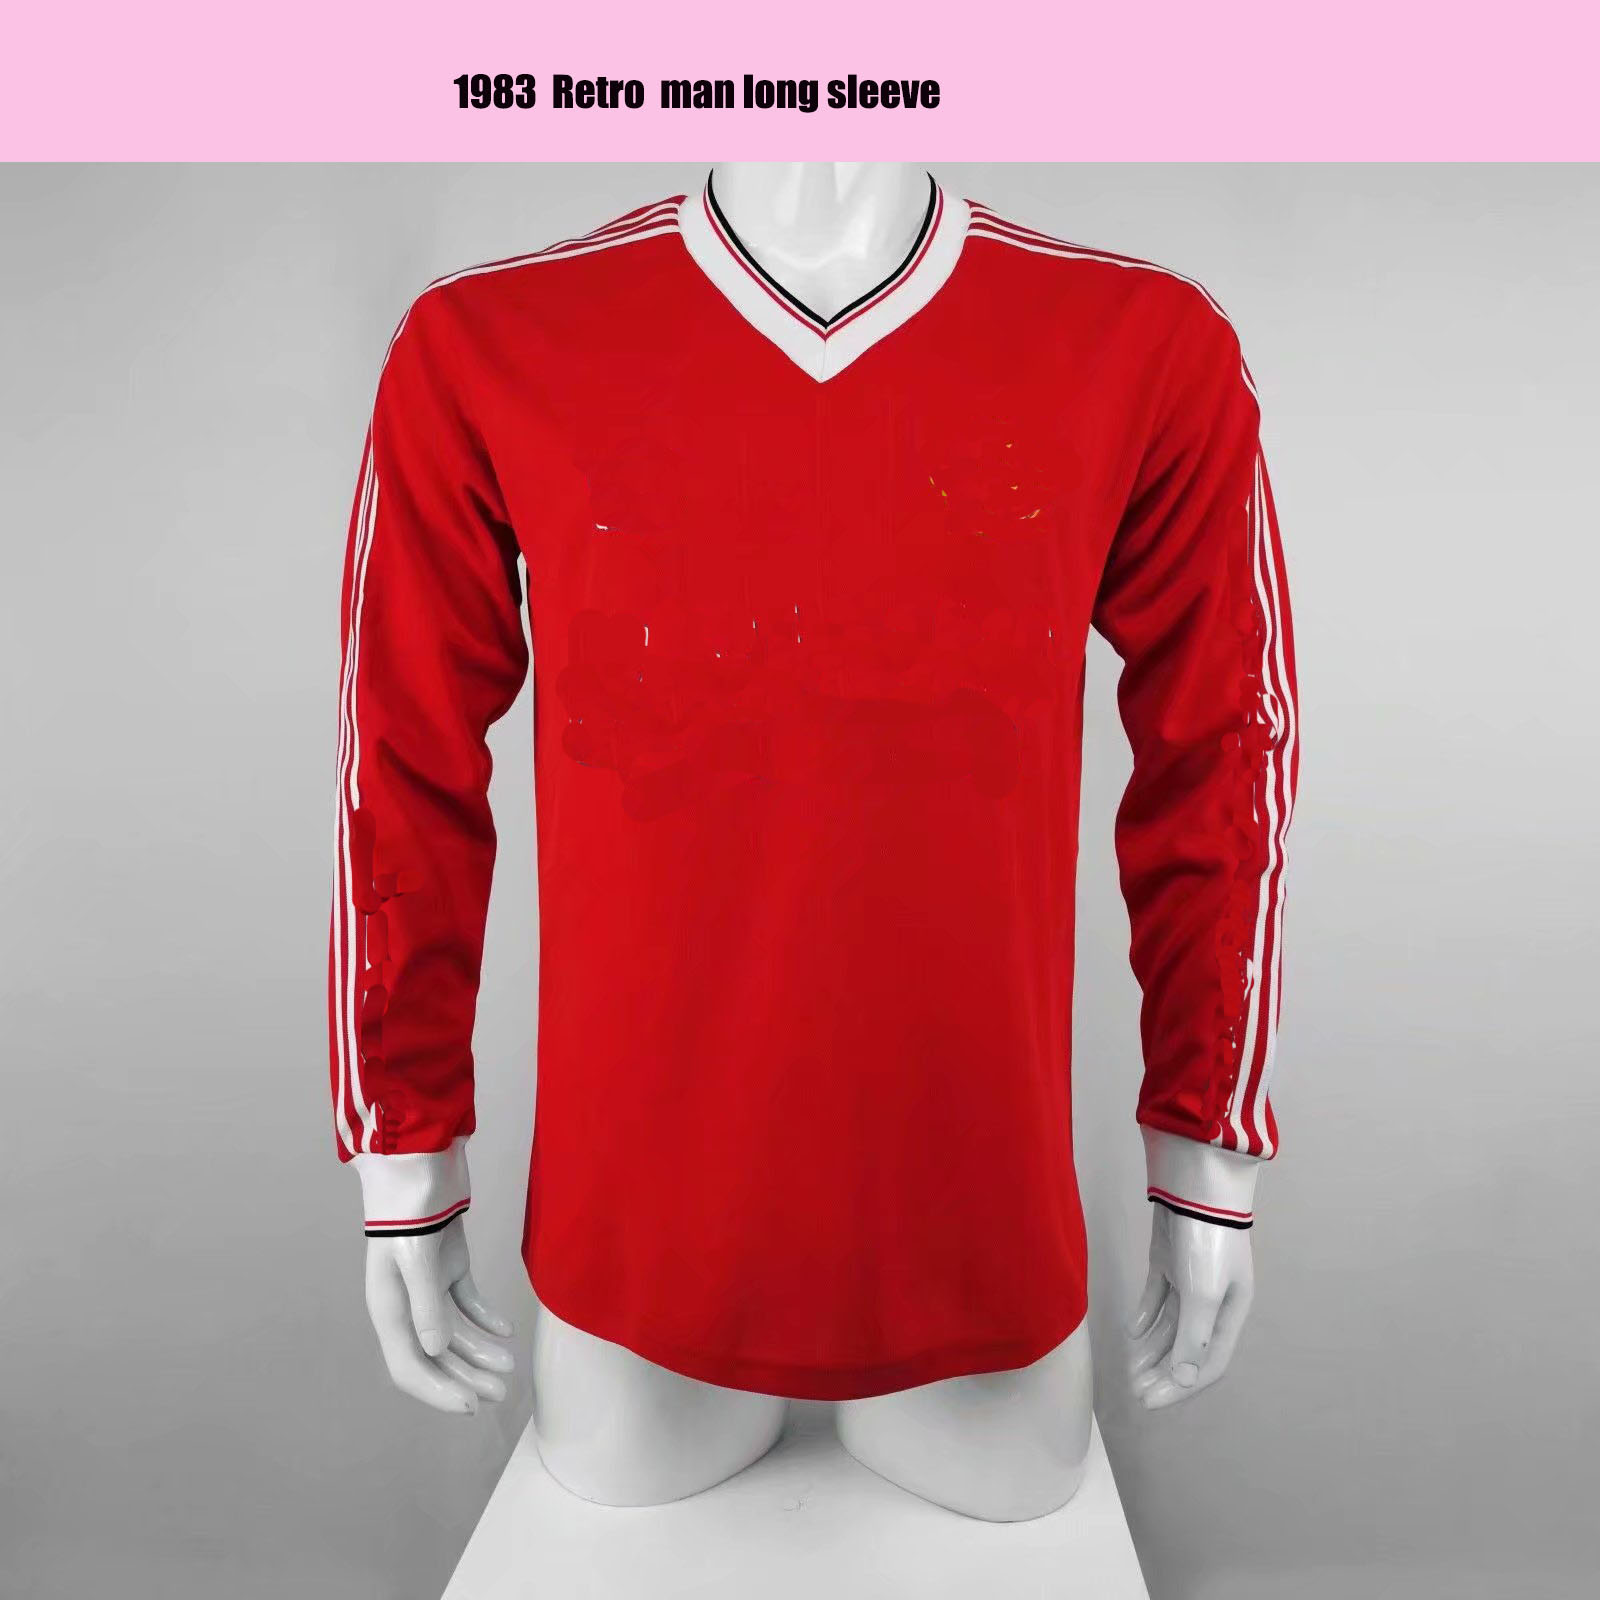 MAN UTD 1982 1983 retro long sleeve soccer jersey red WHITESIDE MAN United 82 83 Classic Vintage football shirts robson man united fans tops